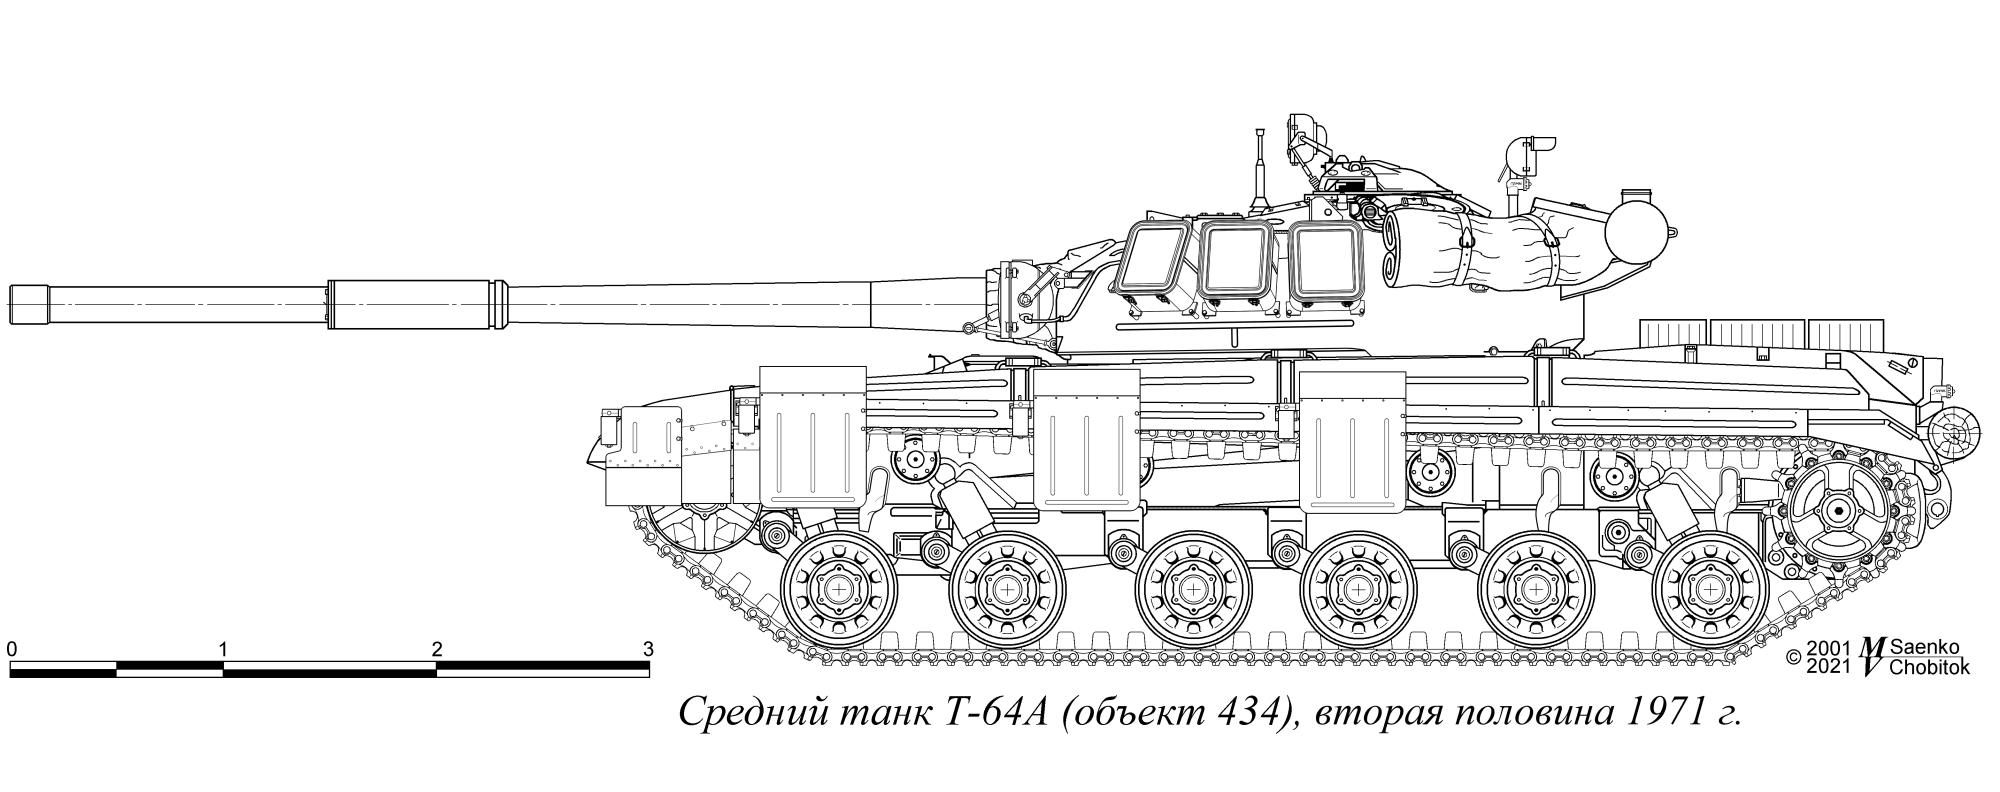 http://armor.kiev.ua/Tanks/Modern/T64/1971/434_71_2.png